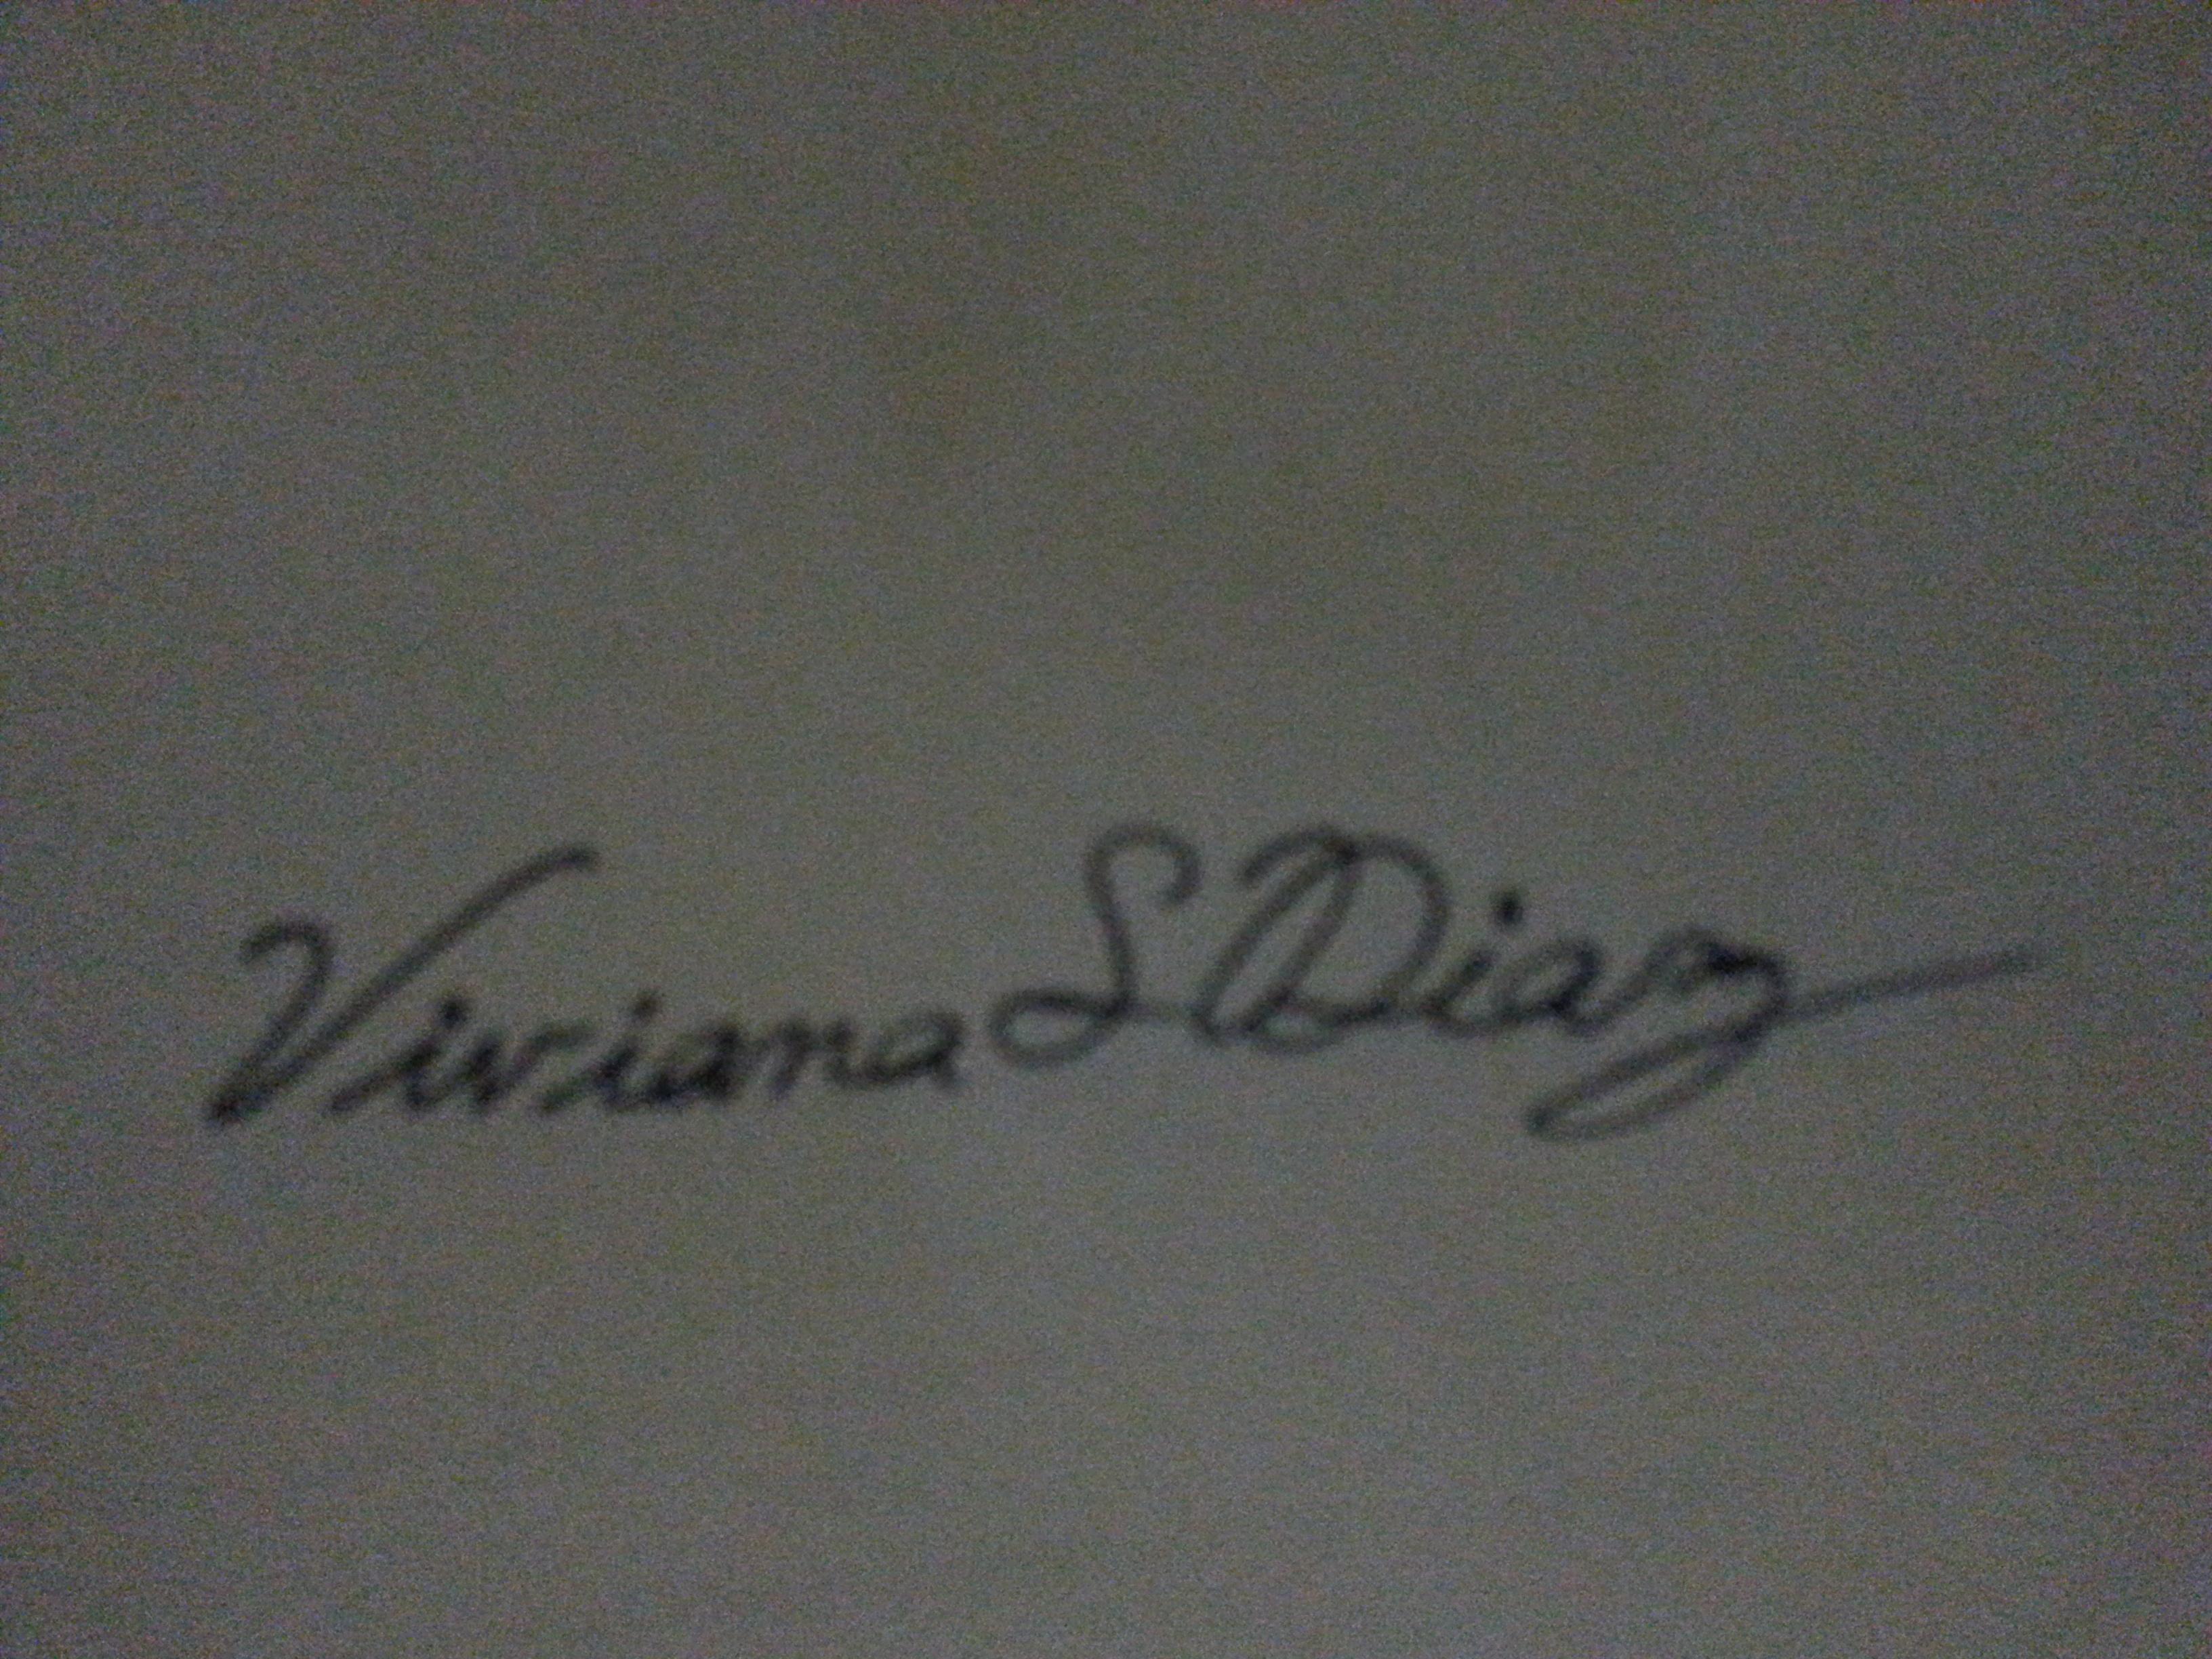 Viviana S. Diaz Signature